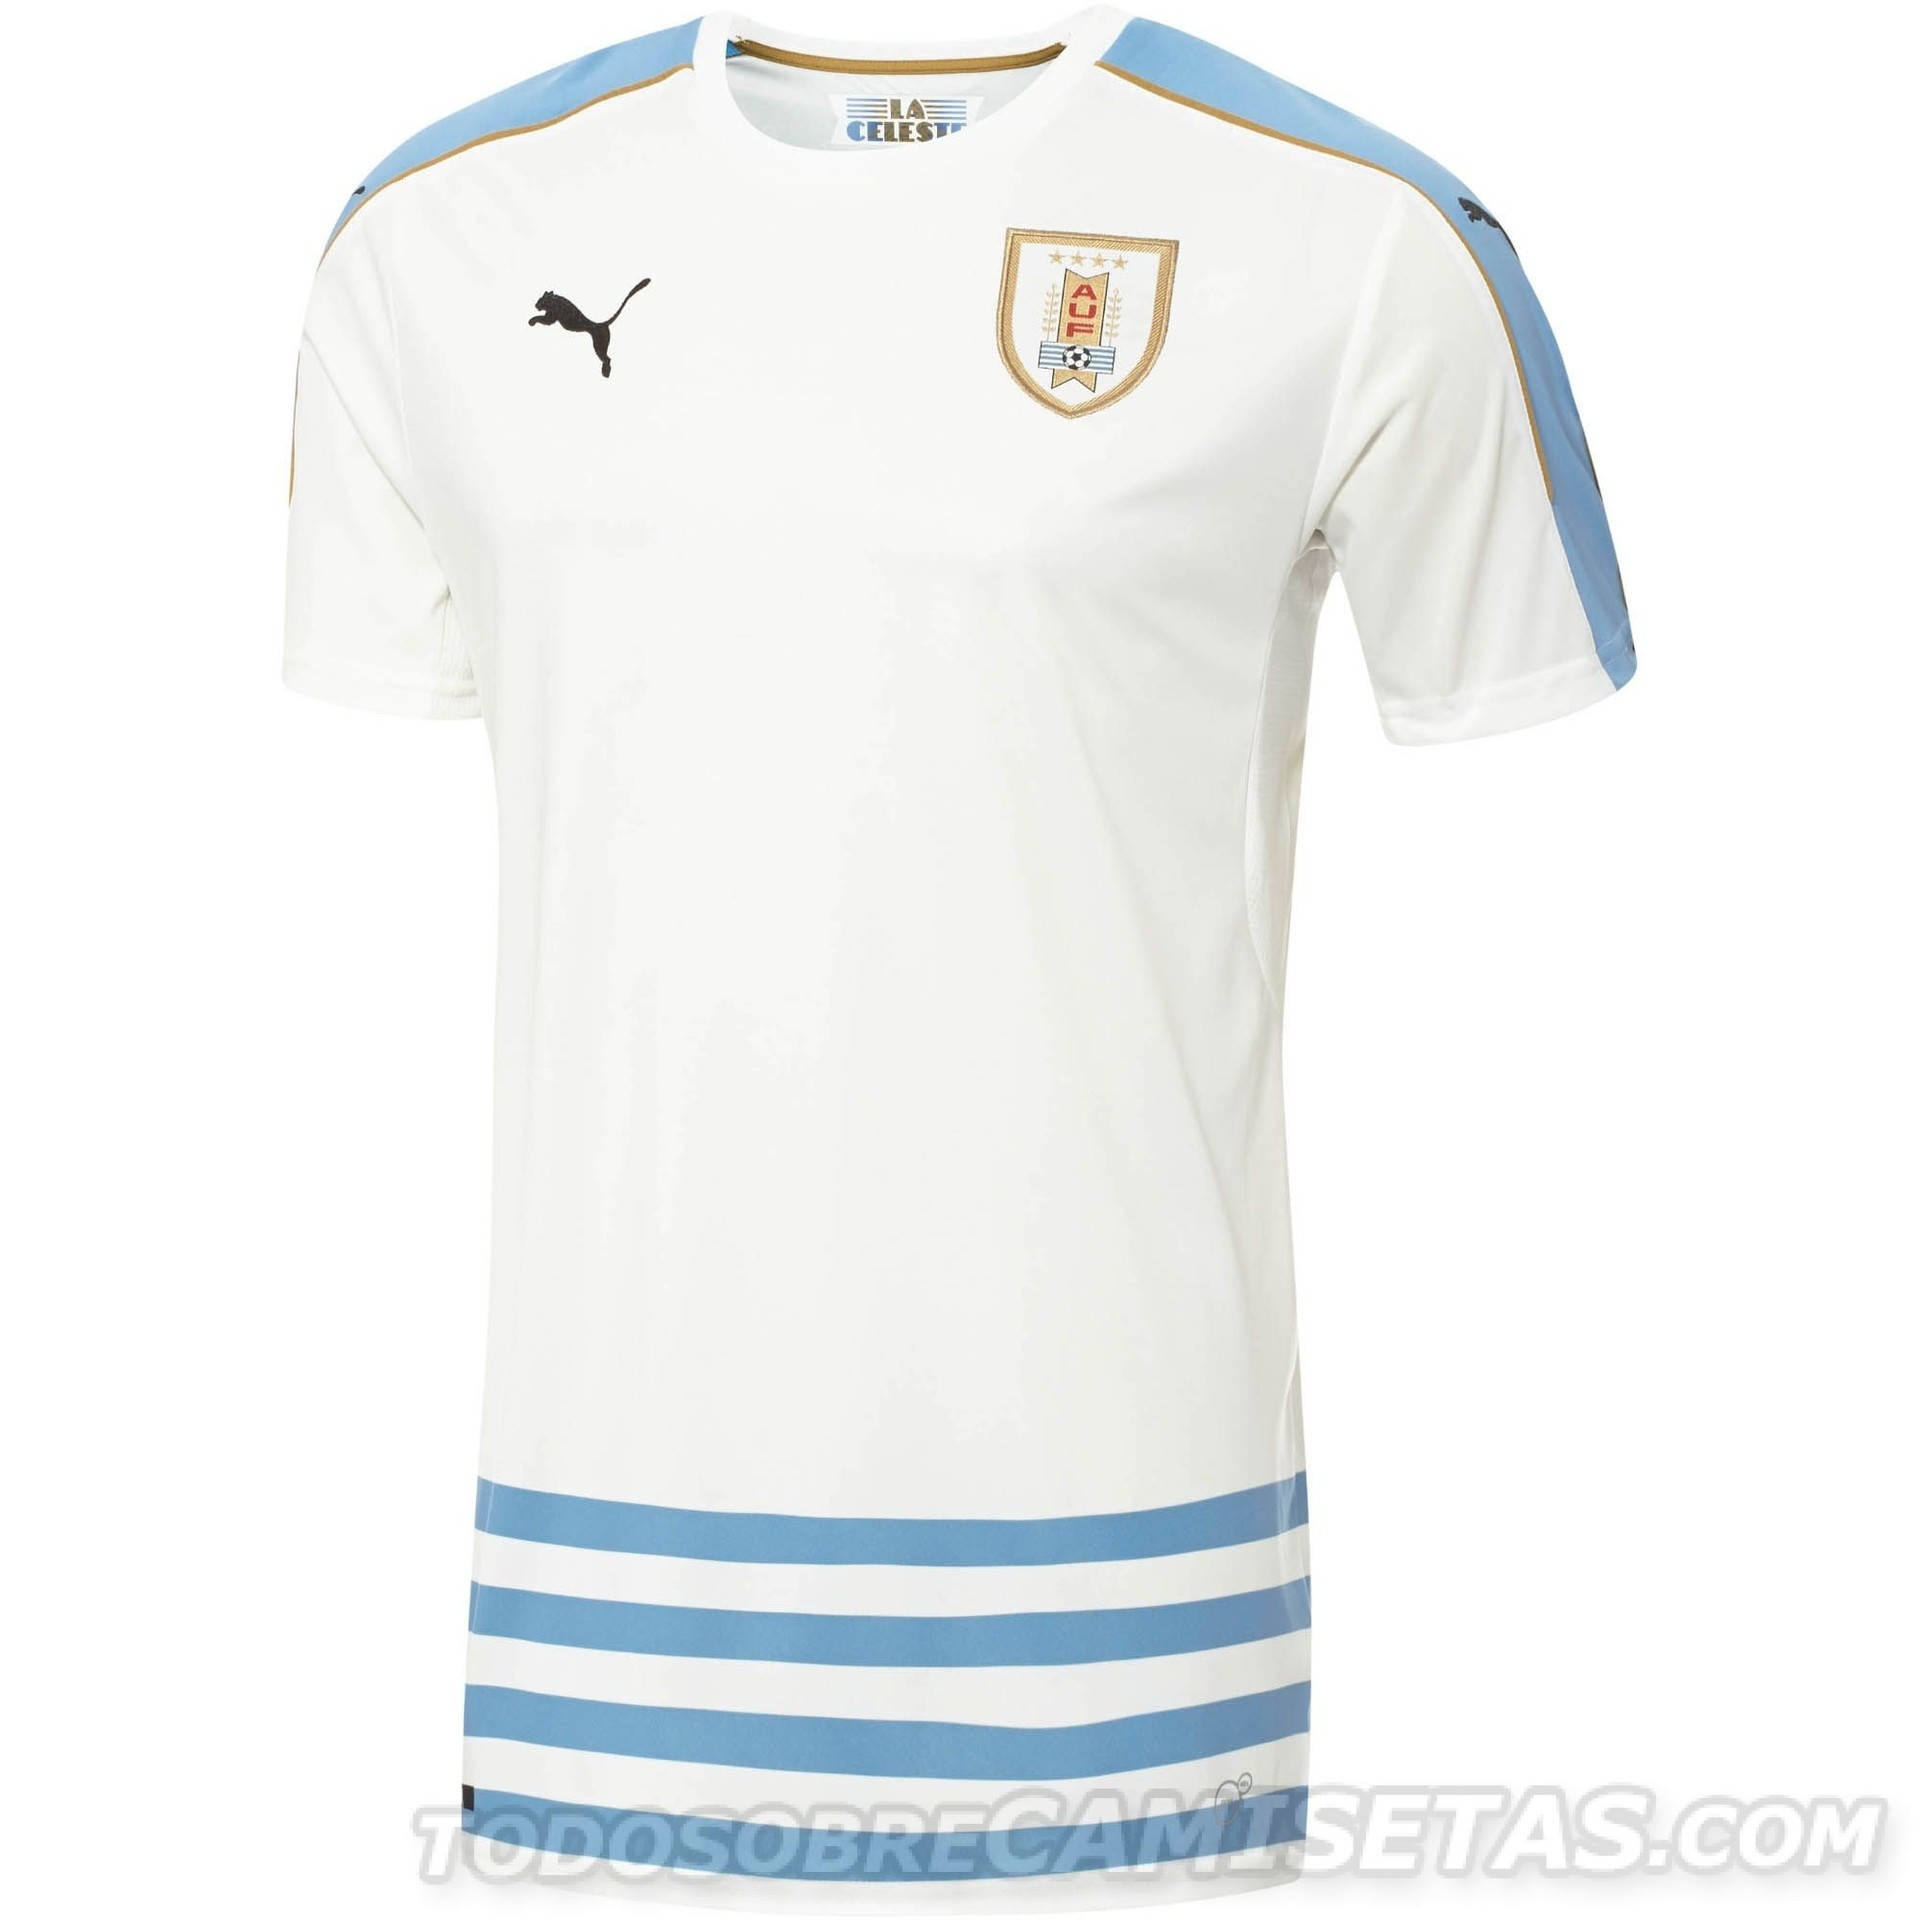 Uruguay-2016-PUMA-new-away-kit-2.jpg